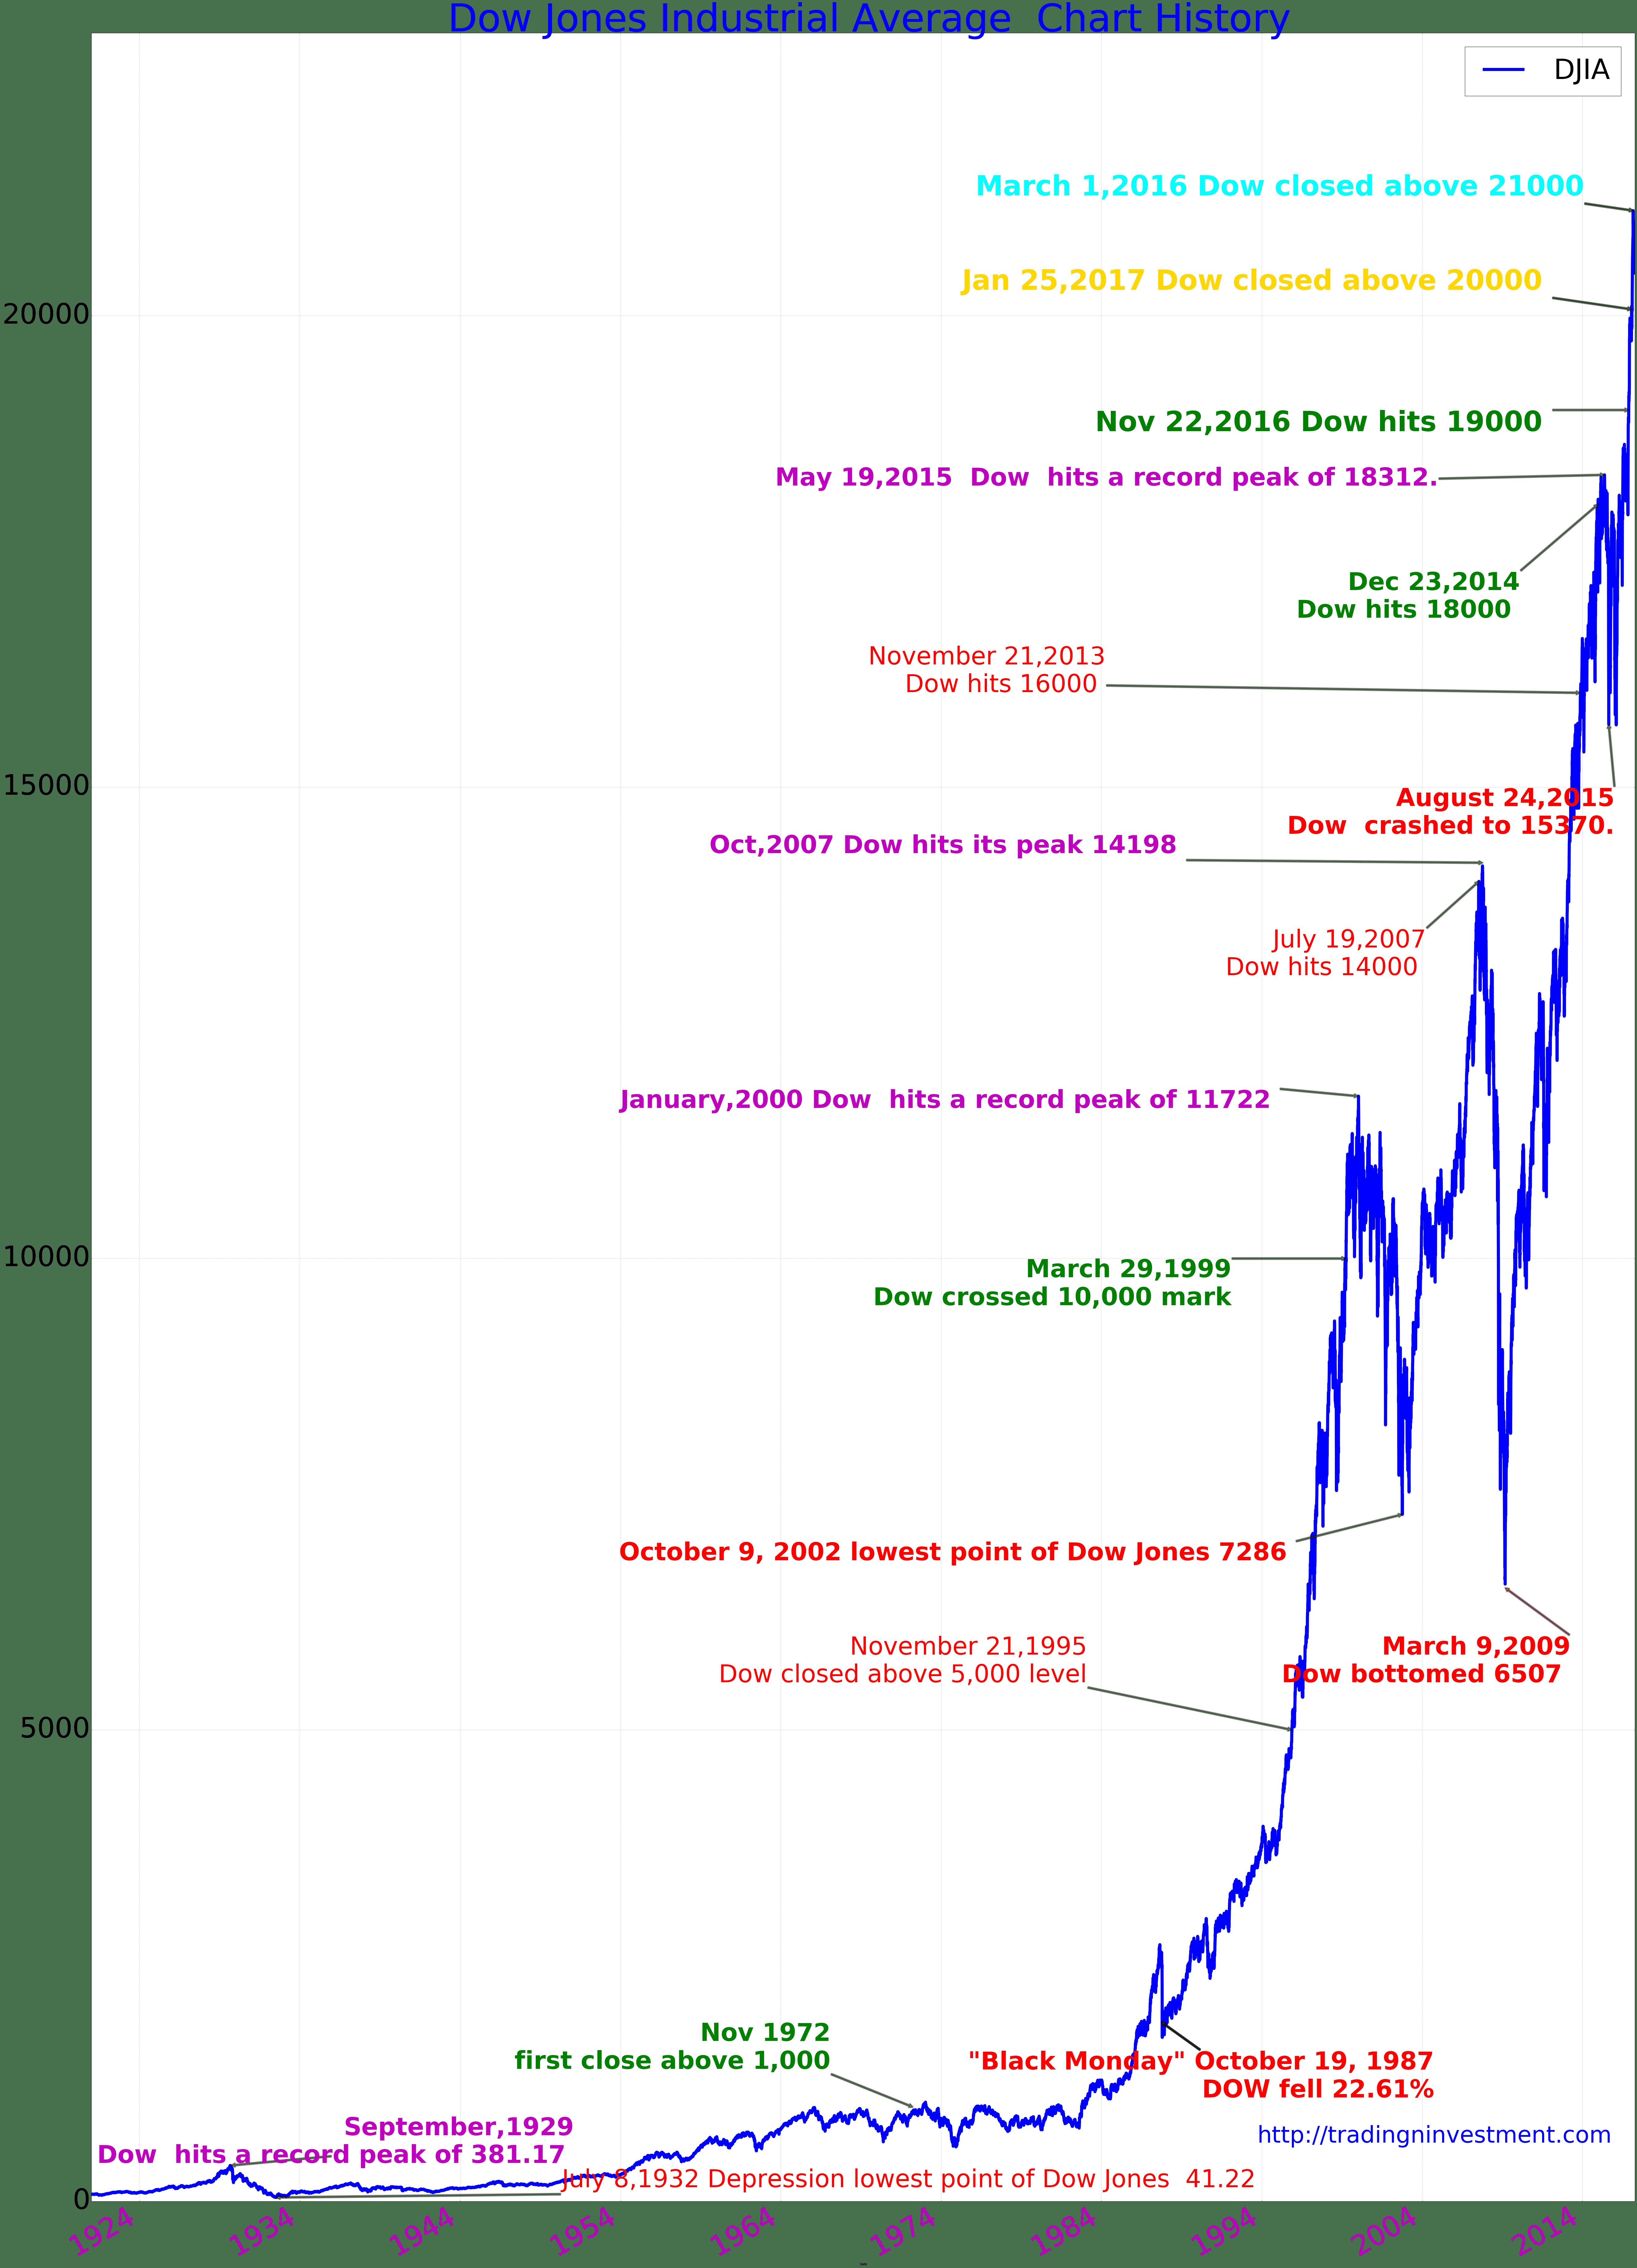 100 Years Dow Jones Industrial Average Chart History